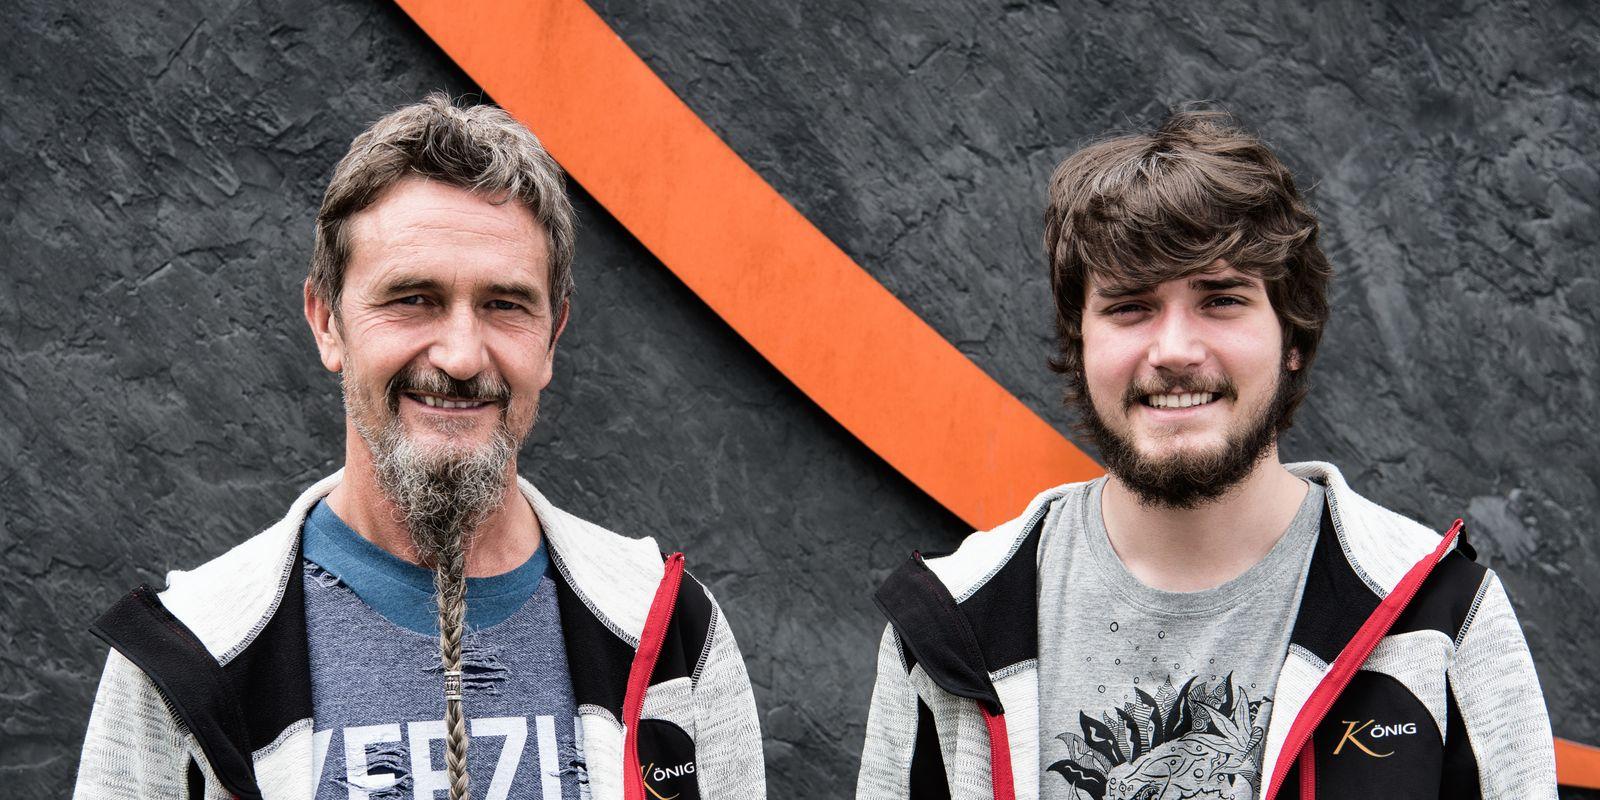 Firmenchef Franz König mit Sohn Mathias